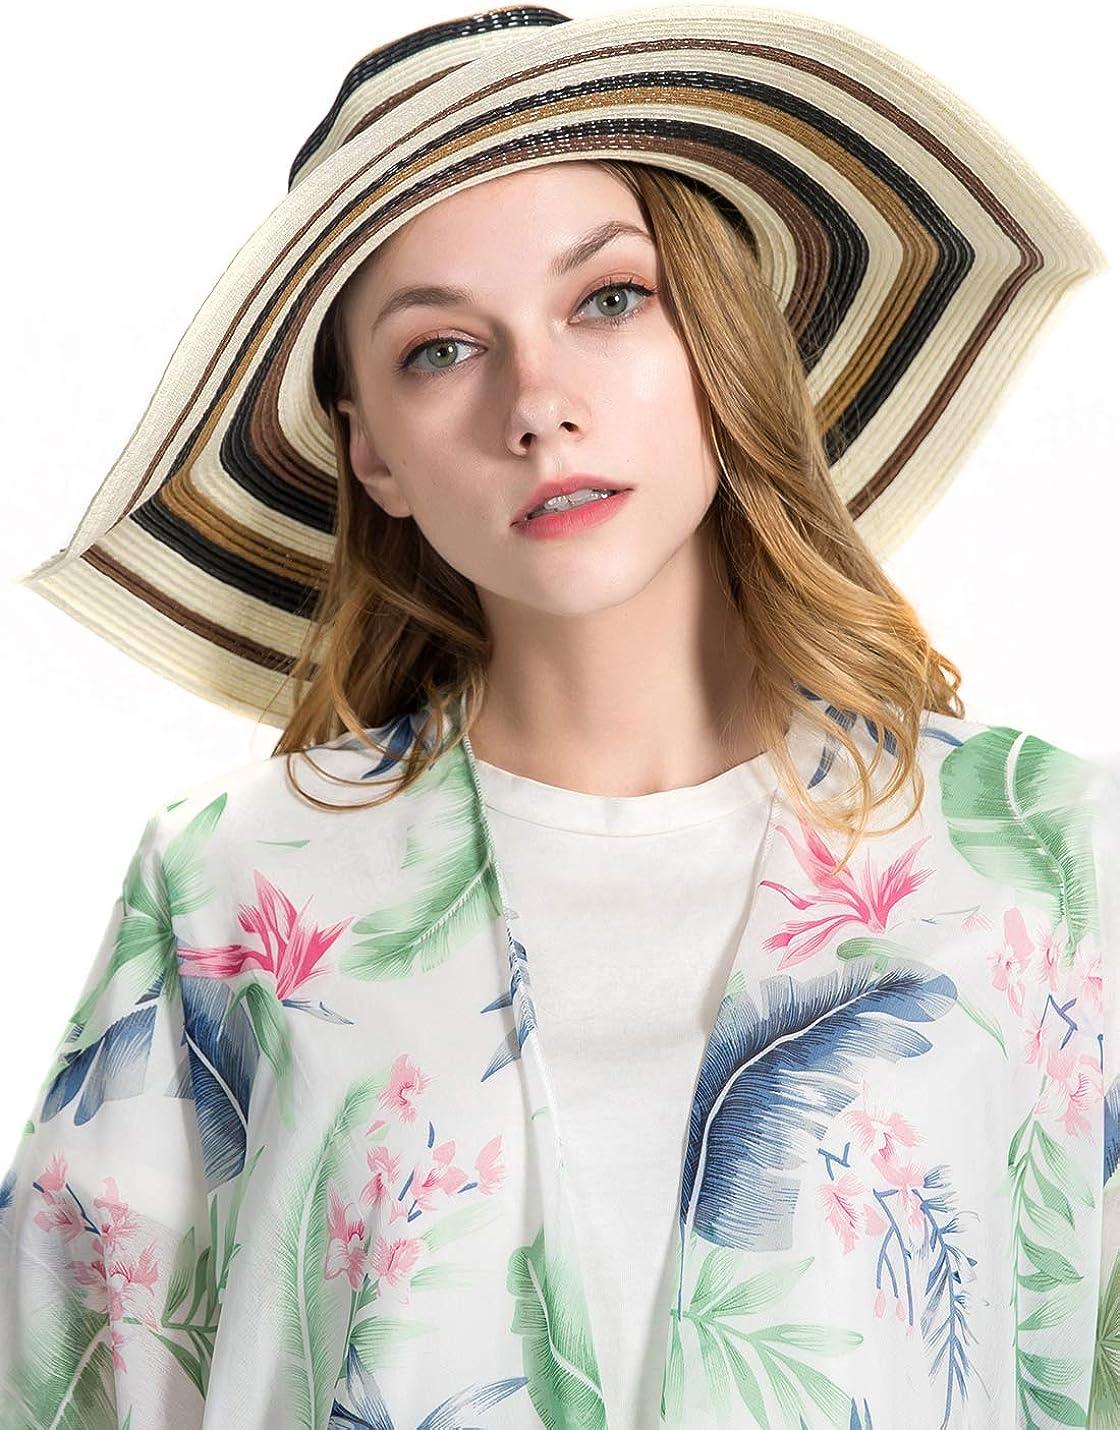 umsif Women Colorful Stripes Wide Brim Straw Panama Hat,Roll Up Hat Fedora Beach Sun Hat for Women Summer Hats UPF50+